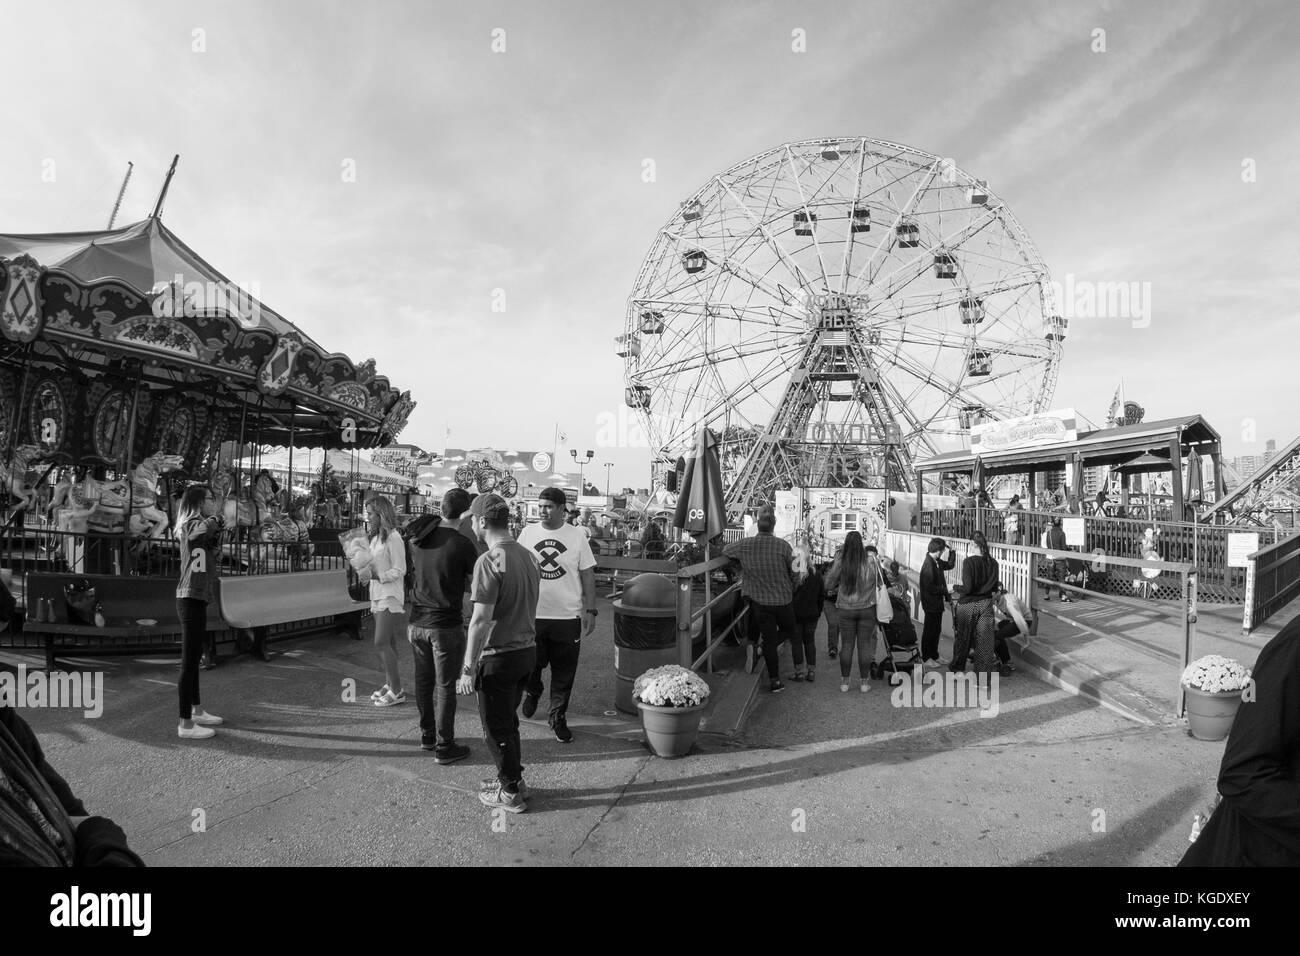 Wonder wheel, Ferris wheel, Coney Island, Brooklyn, New York. United States of America. U.S.A - Stock Image